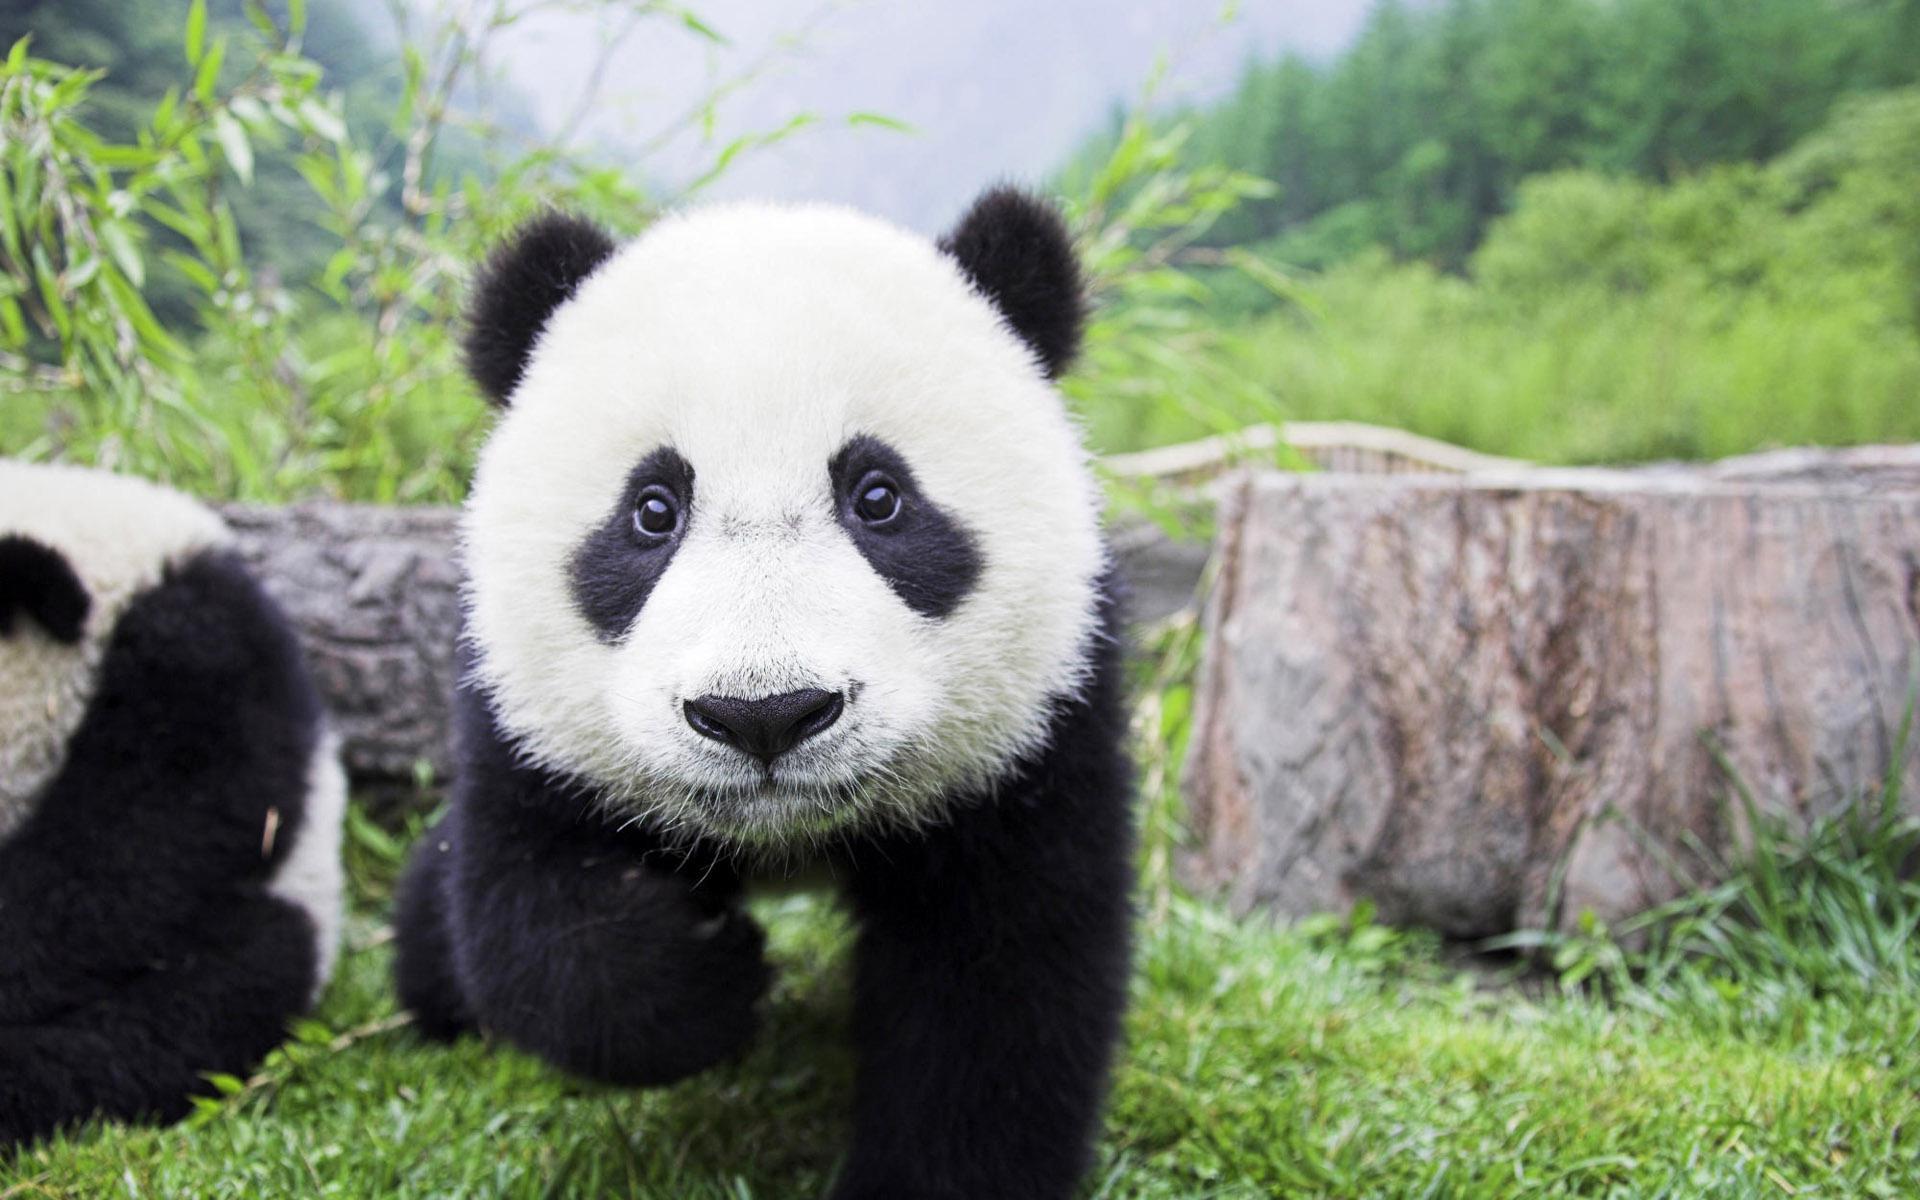 Giant panda photo